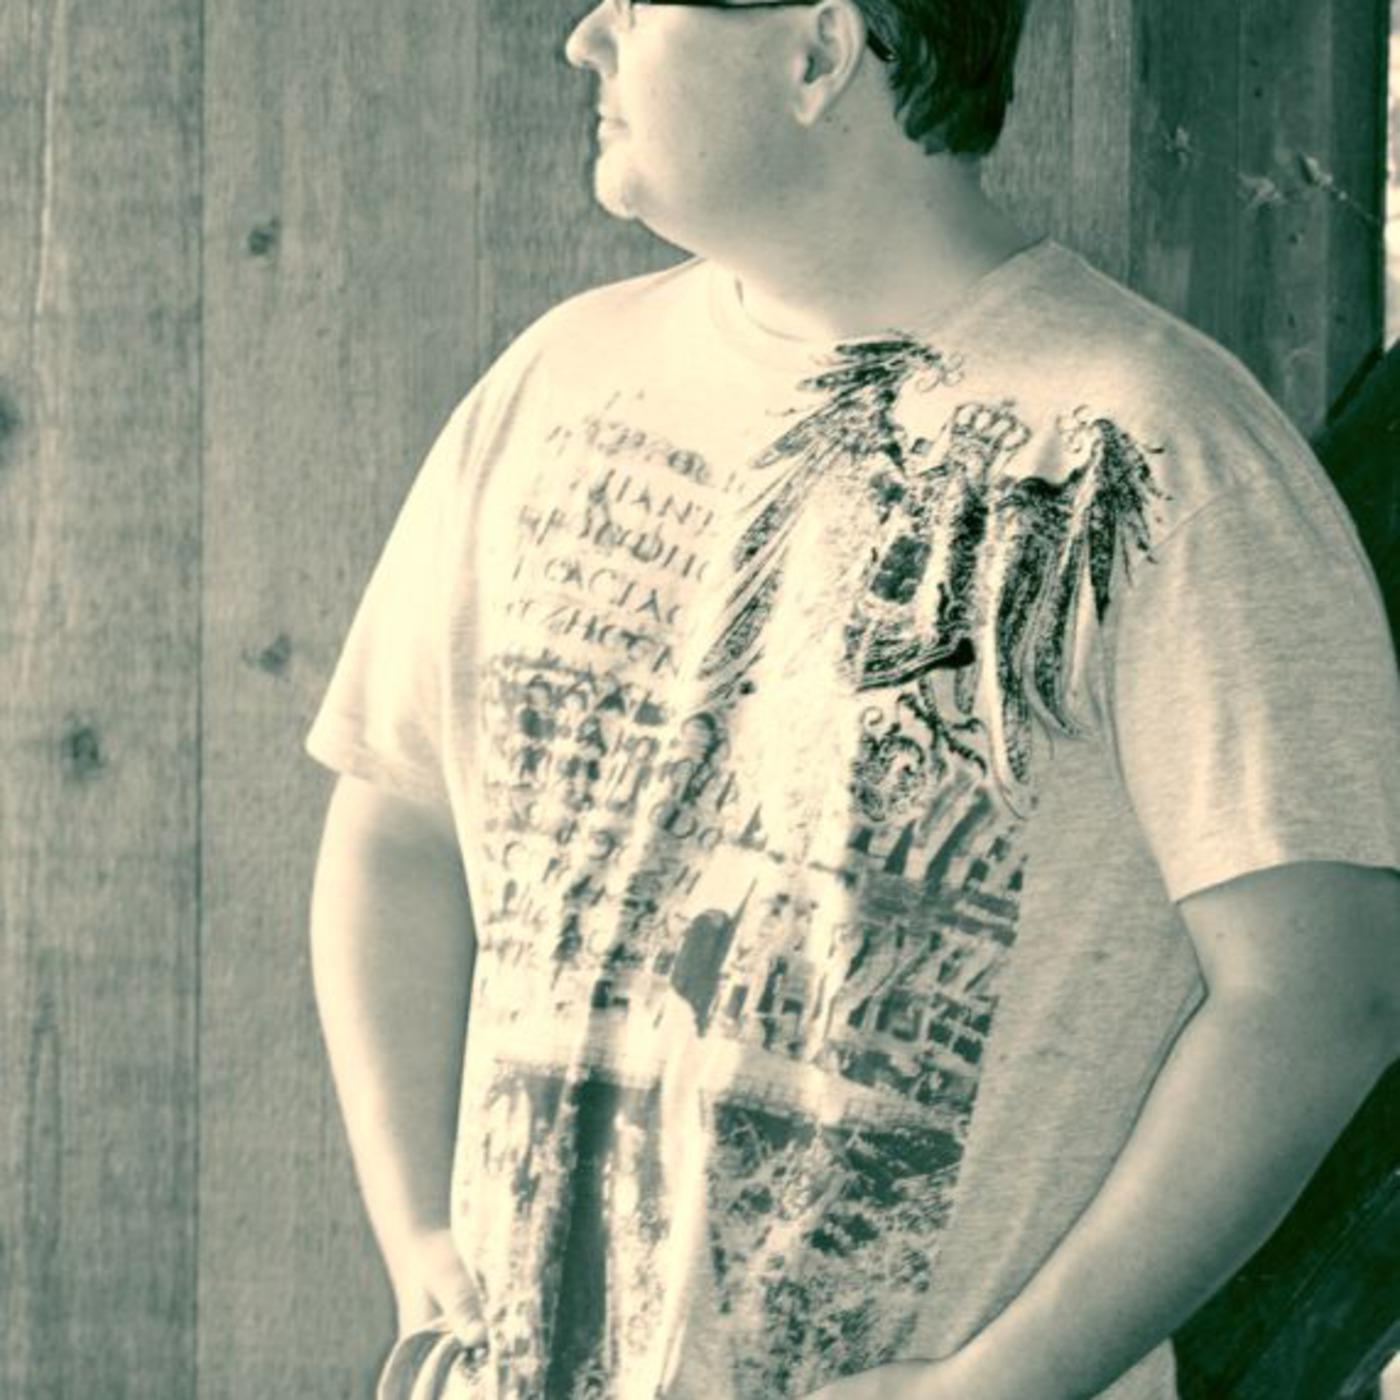 Pastor Eric Schall